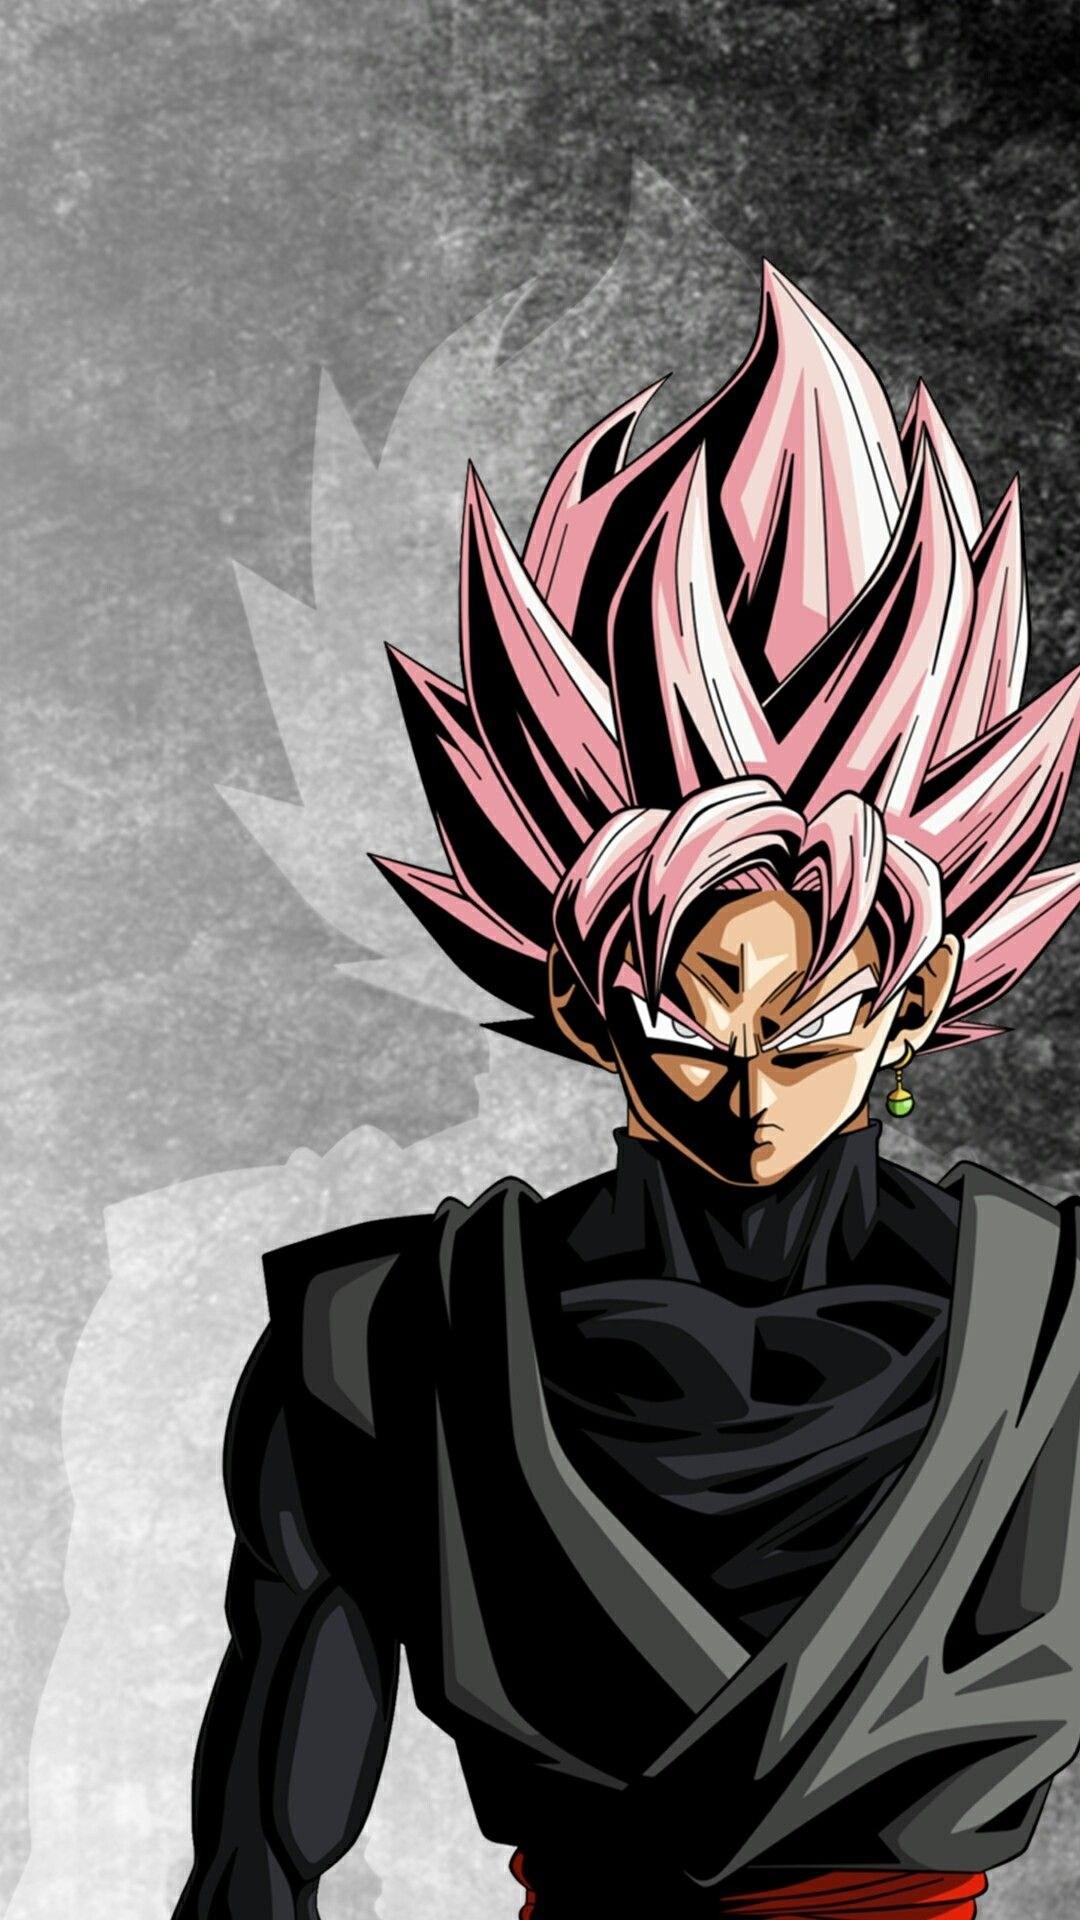 Unique Black Goku Wallpaper Iphone Goku Black Wallpaper Iphone 49742 Hd Wallpaper Backgrounds Download